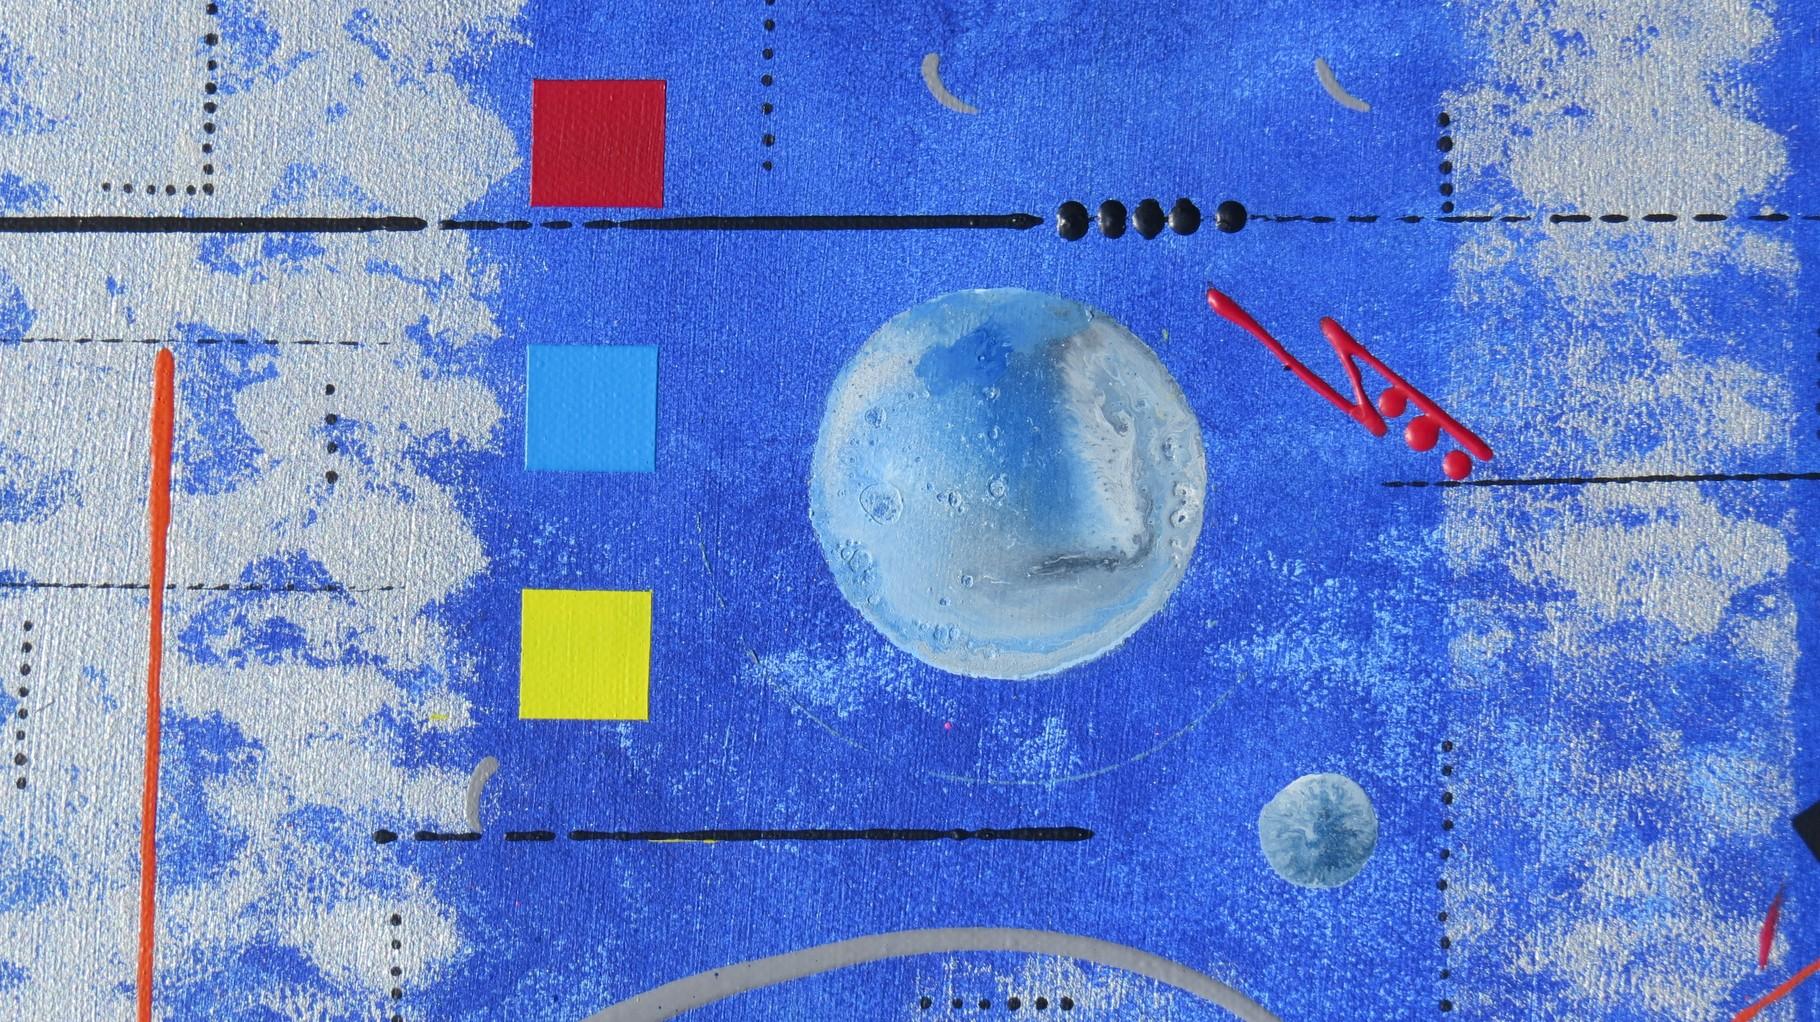 confins.zoom3 - daluz galego peinture tableau abstrait abstraction